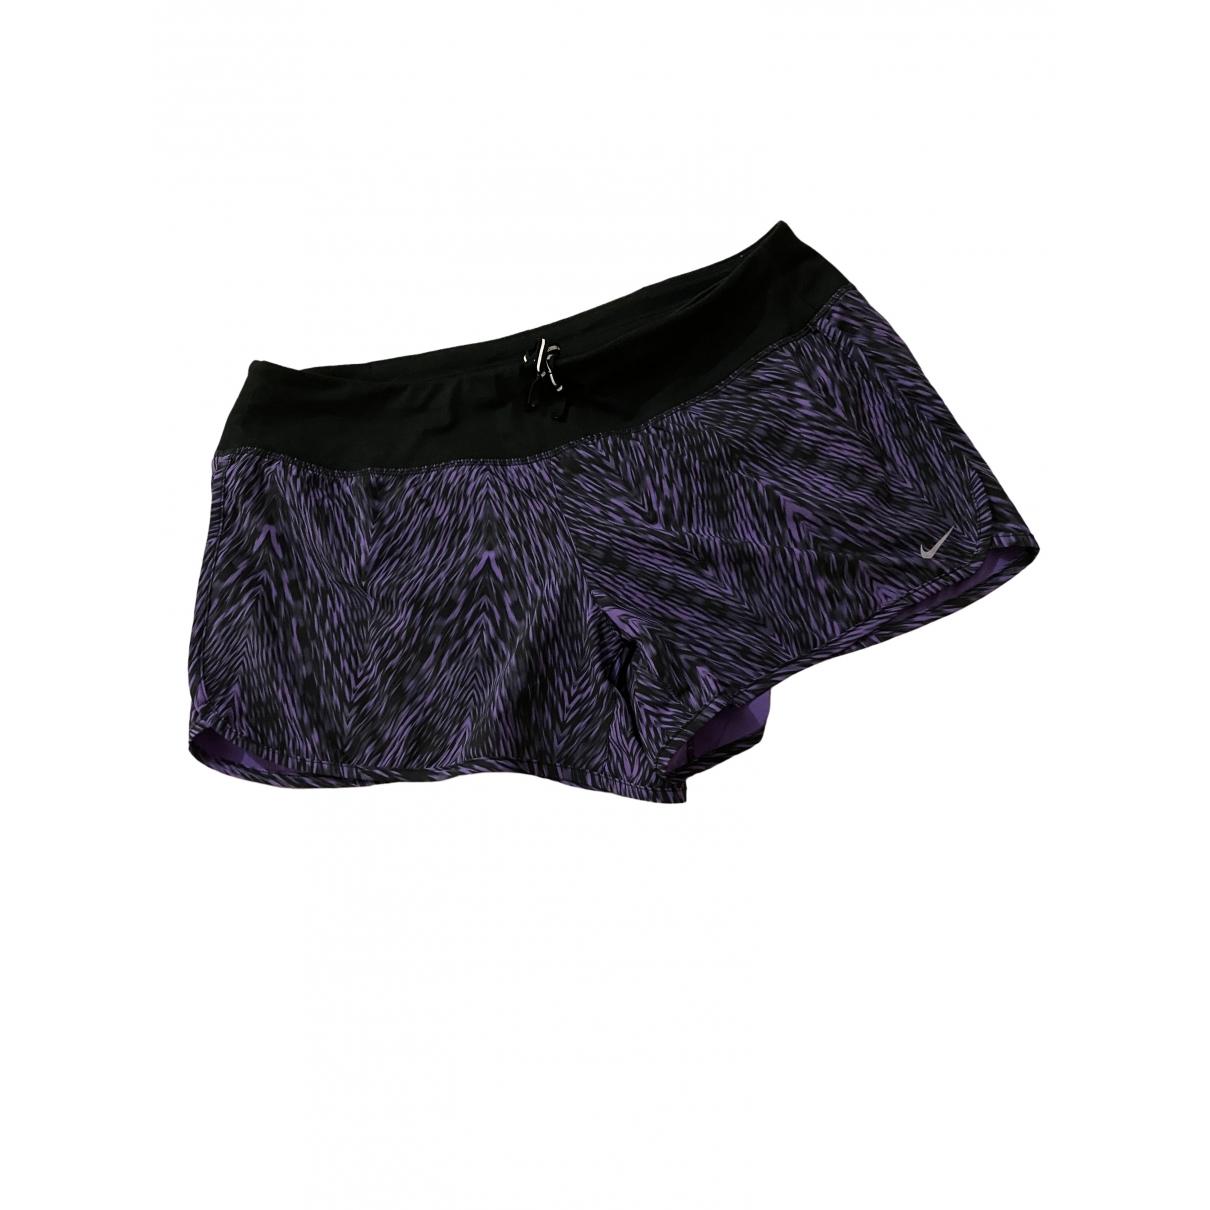 Nike \N Multicolour Shorts for Women L International